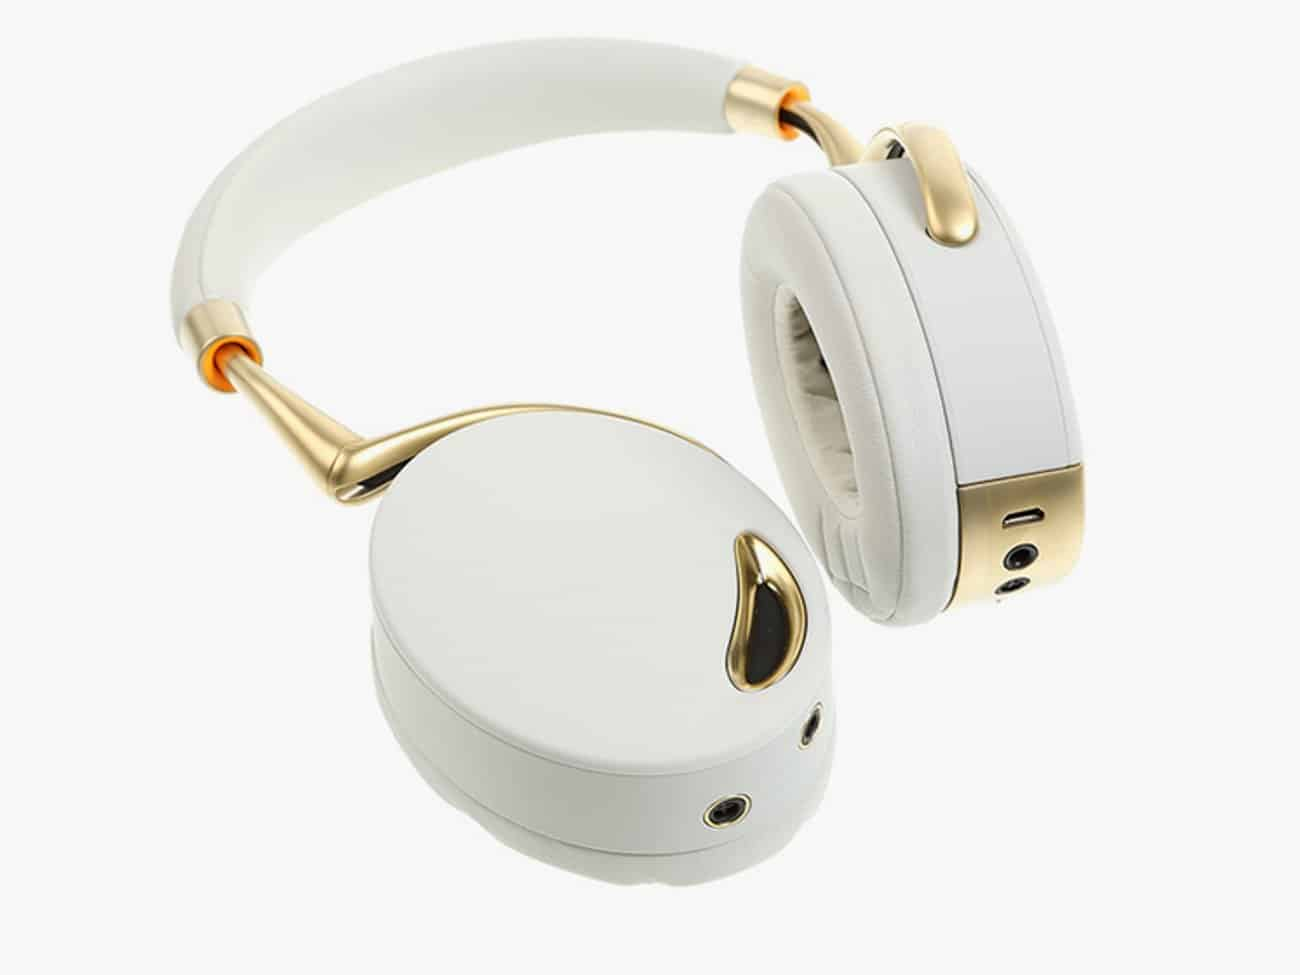 agiftidea - Zik Wireless Noise Cancelling Headphones